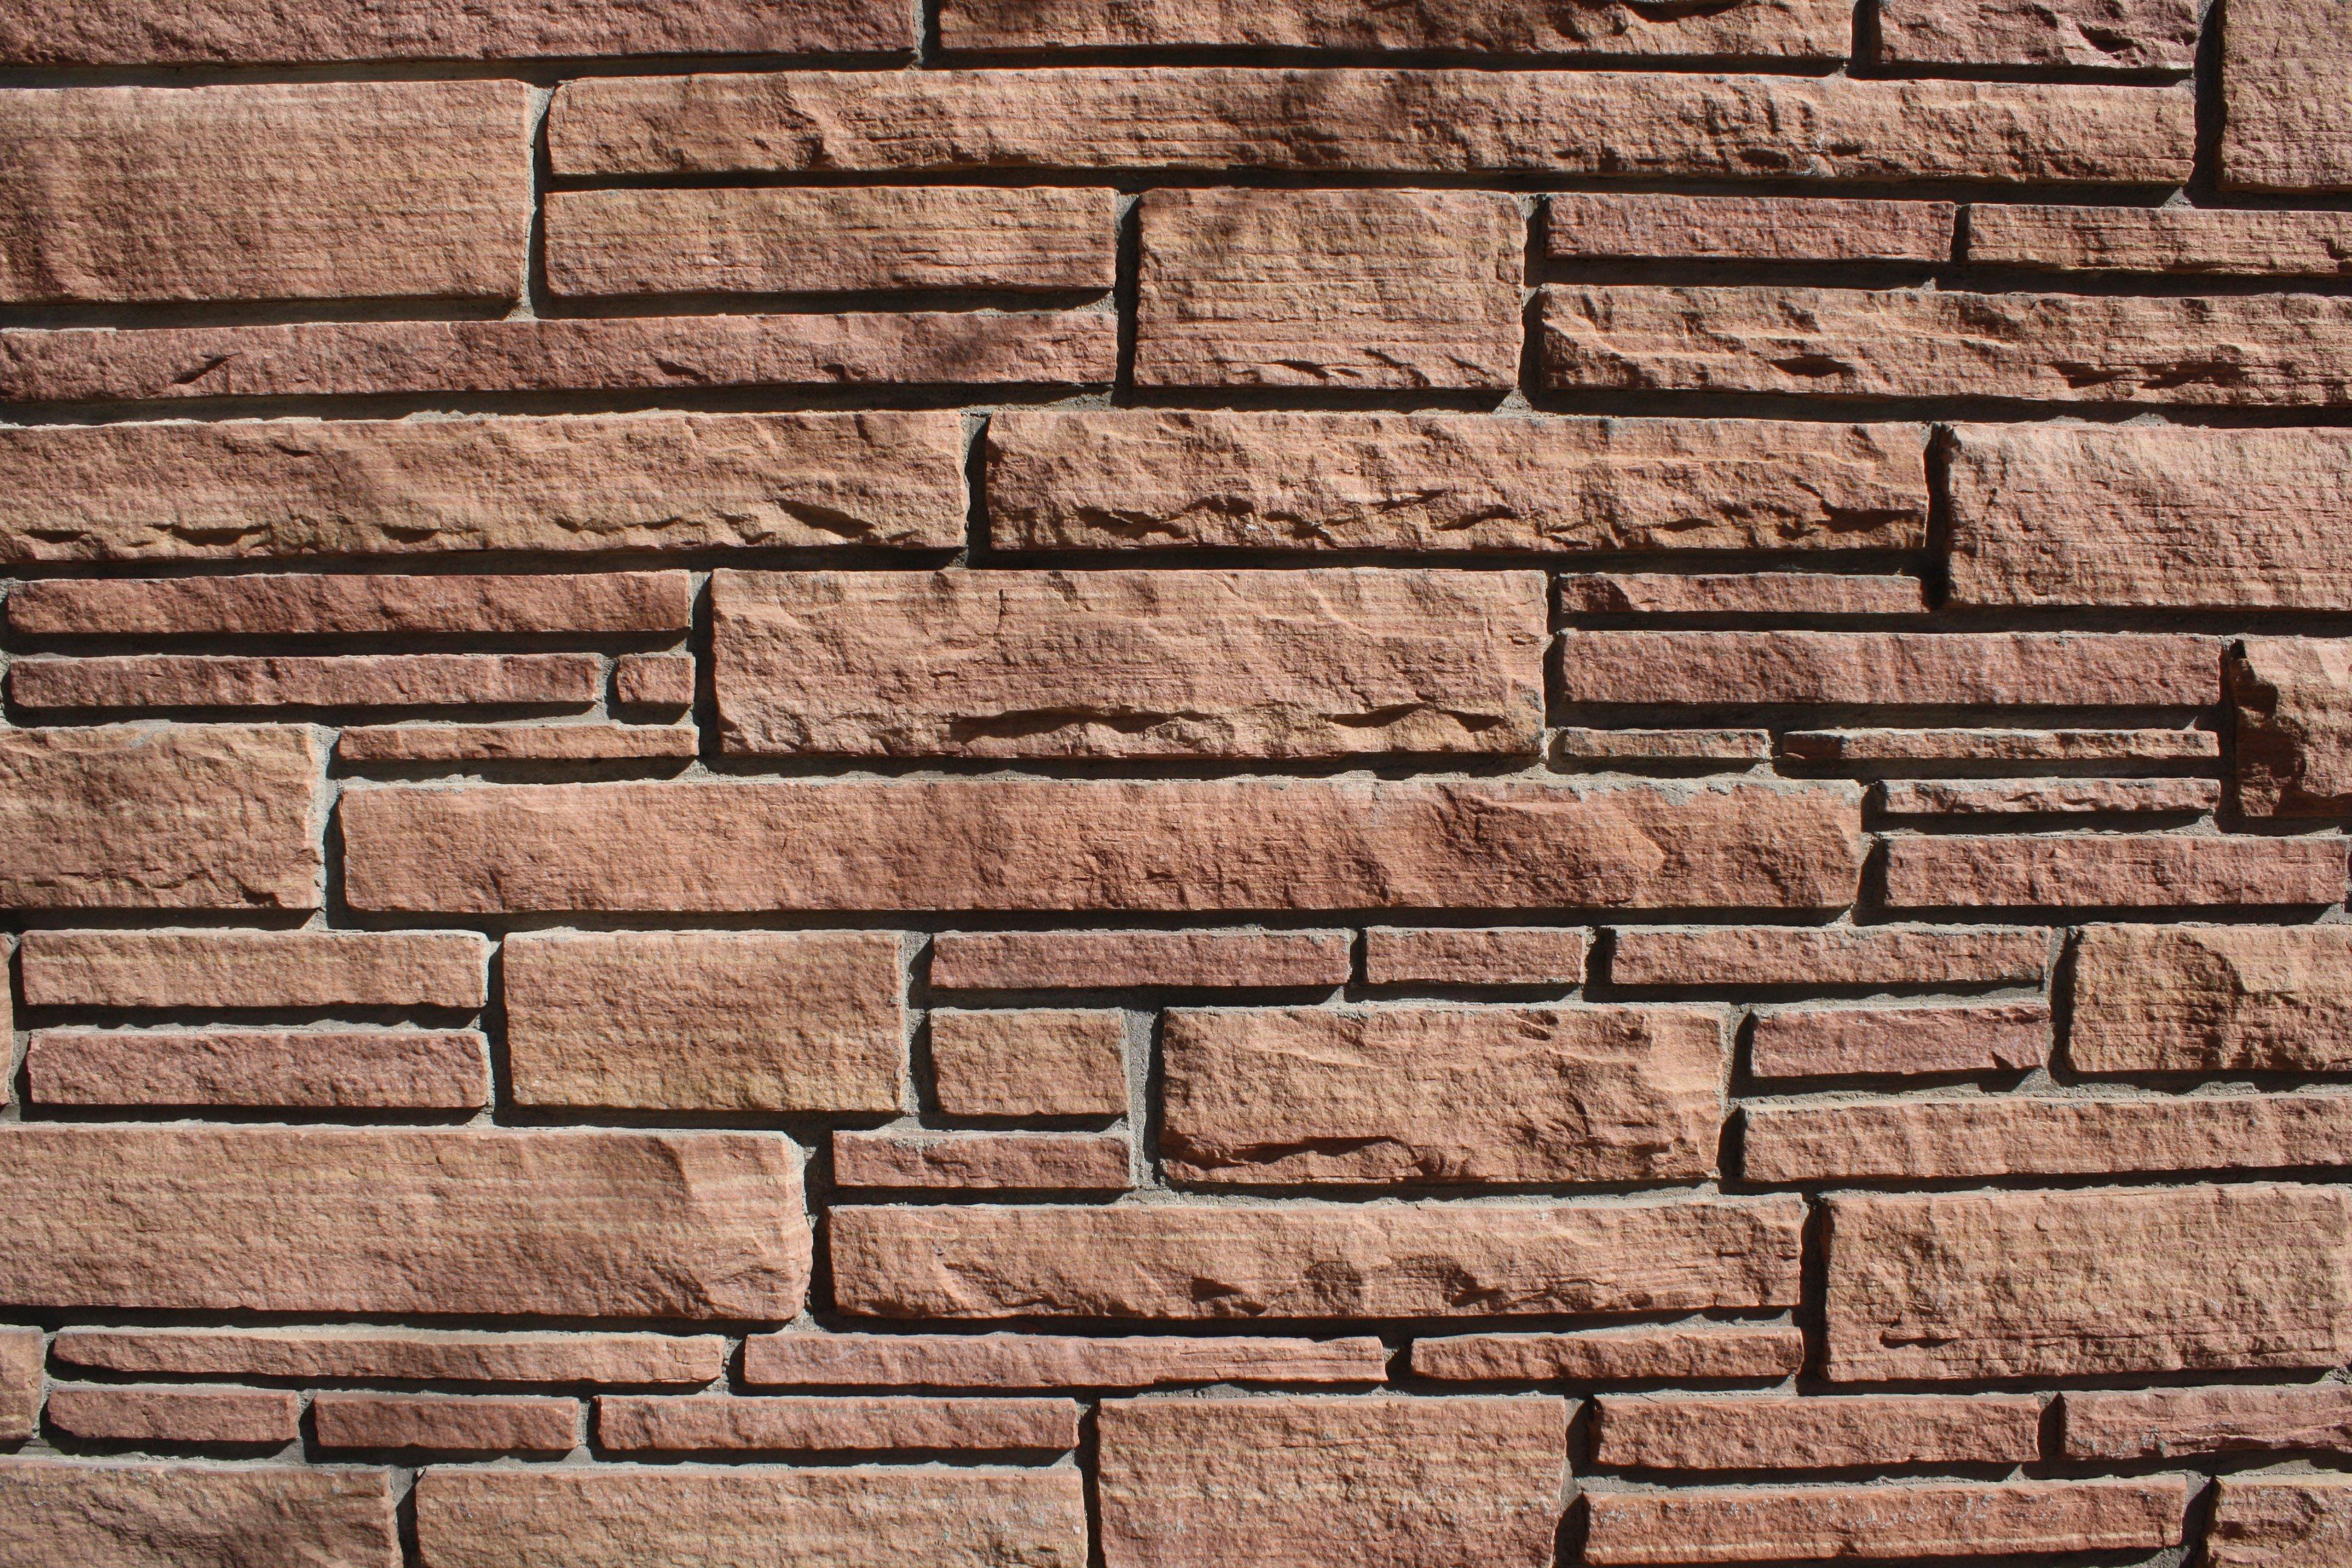 Brick wall texture free high resolution photo materials brick - Sandstone Wallpaper Wallpapersafari